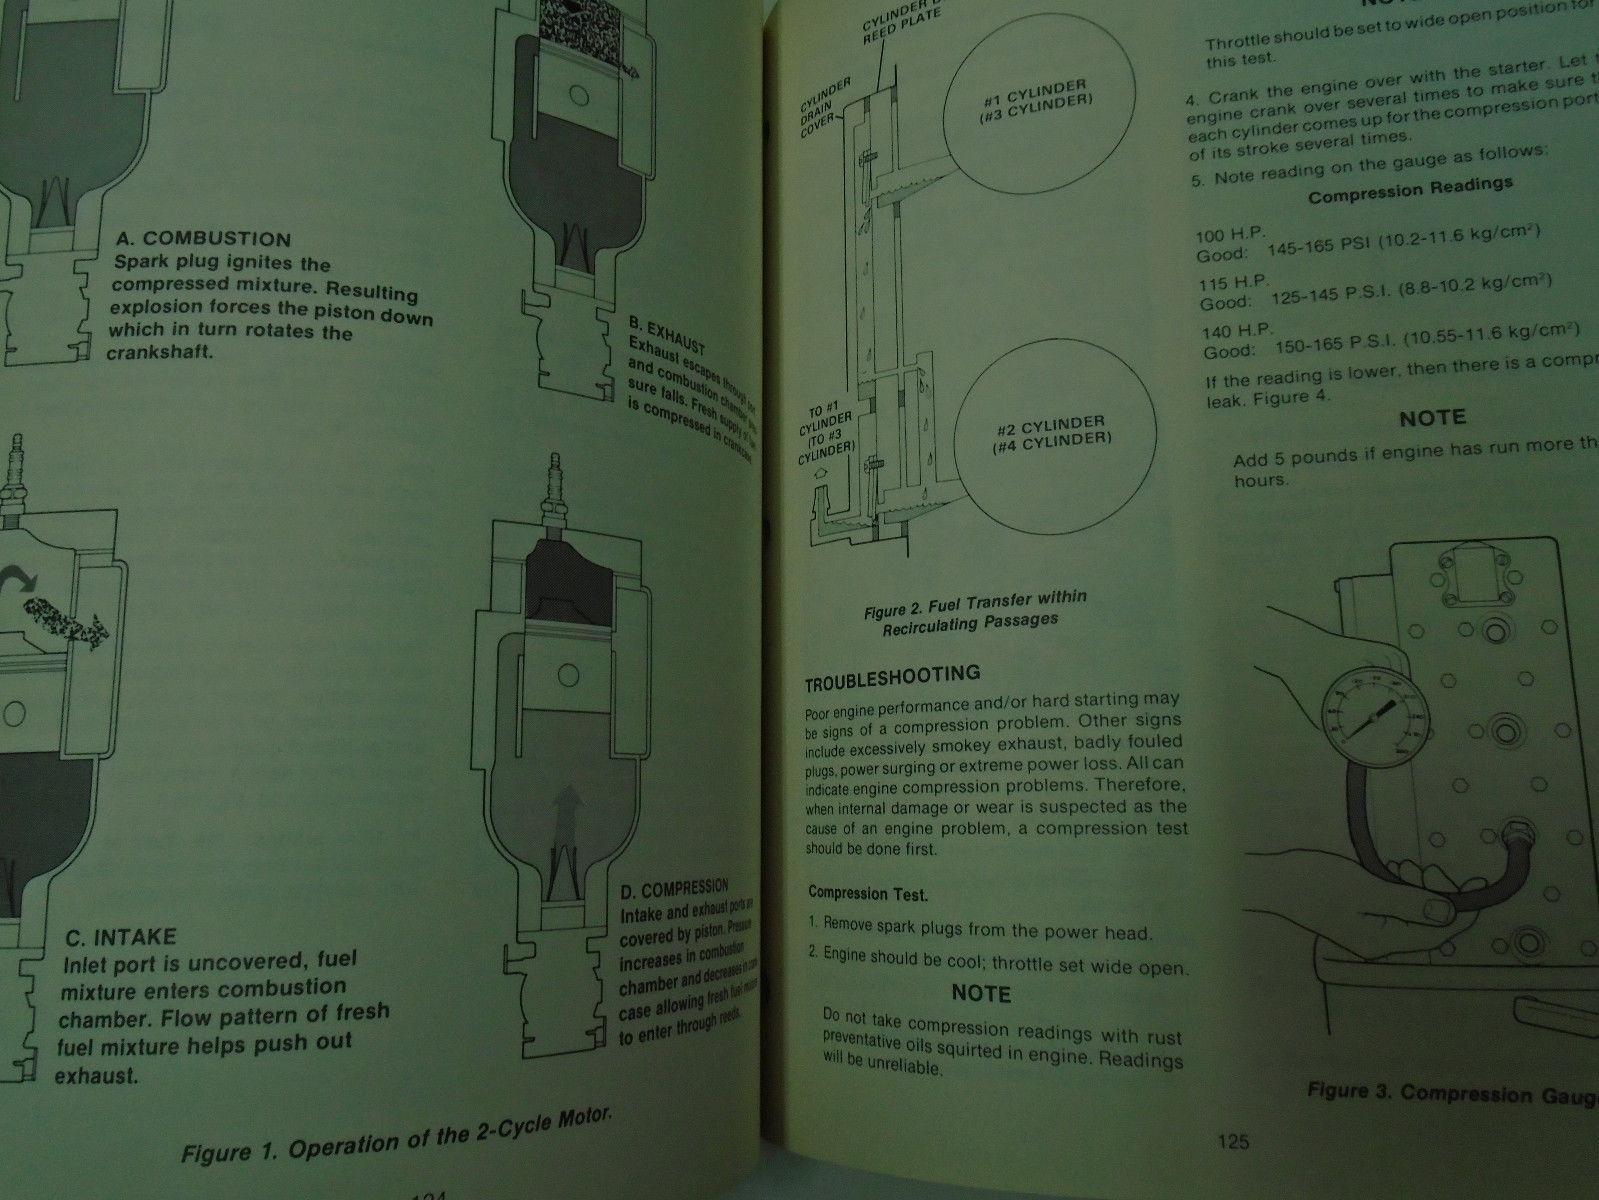 1981 Chrysler Outboard Service Manual 100 115 140 HP Factory FEO Book OB 3439